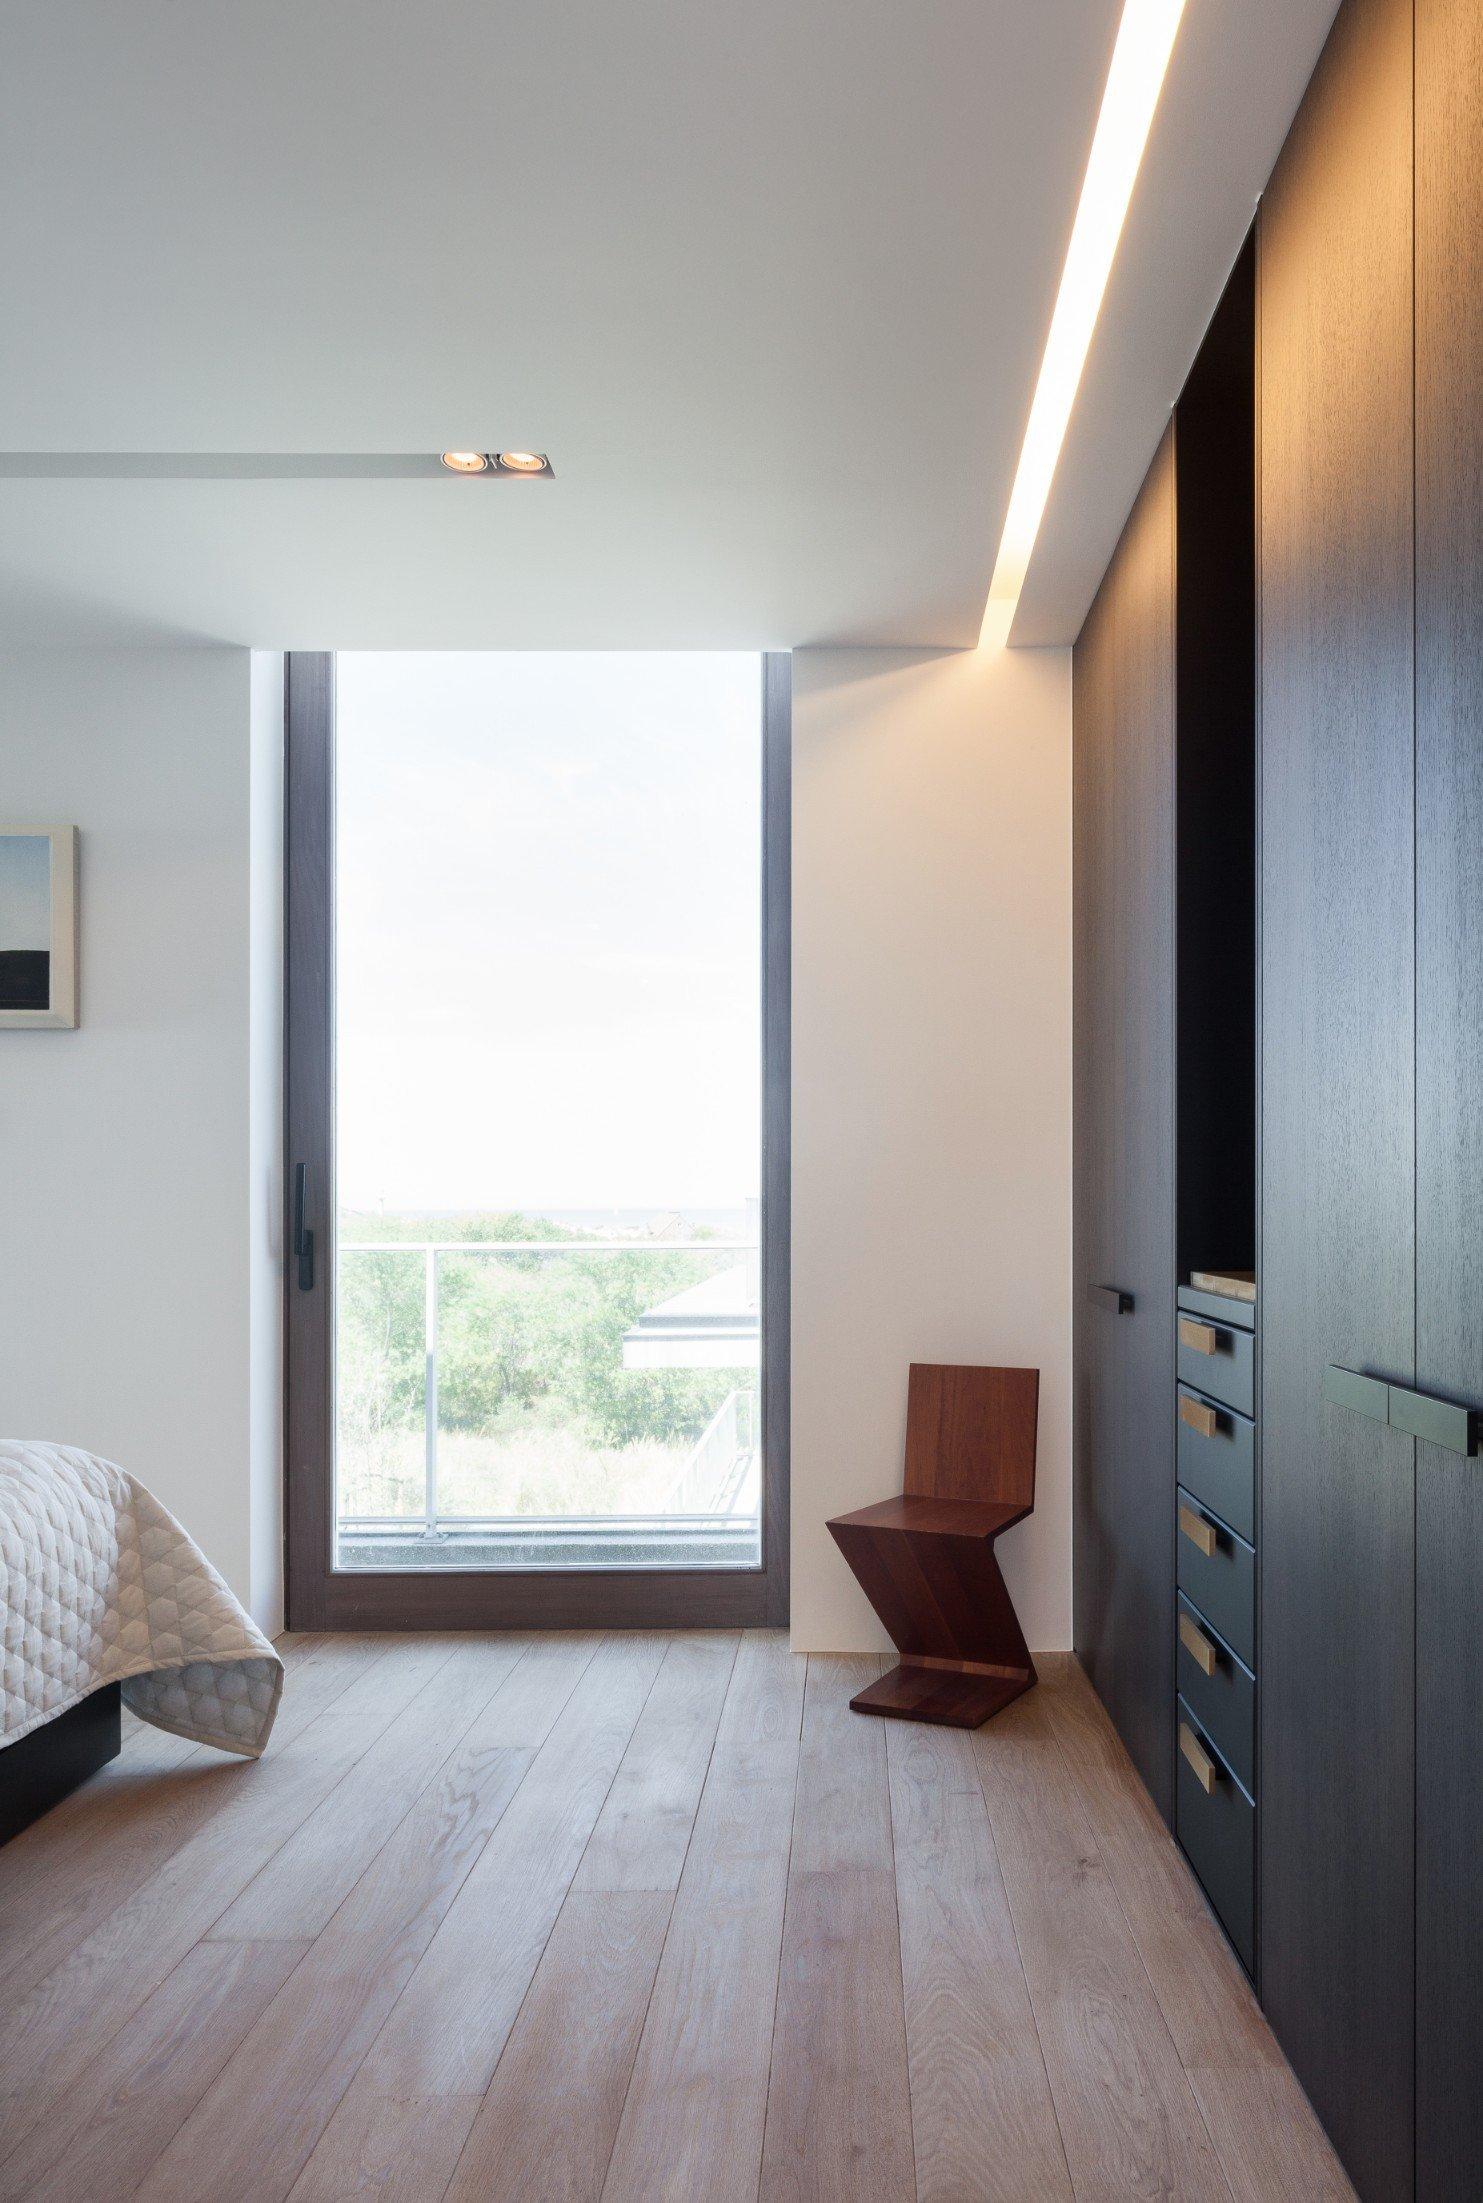 Rietveldprojects-penthouse-appartement-design-architectuur-kust6